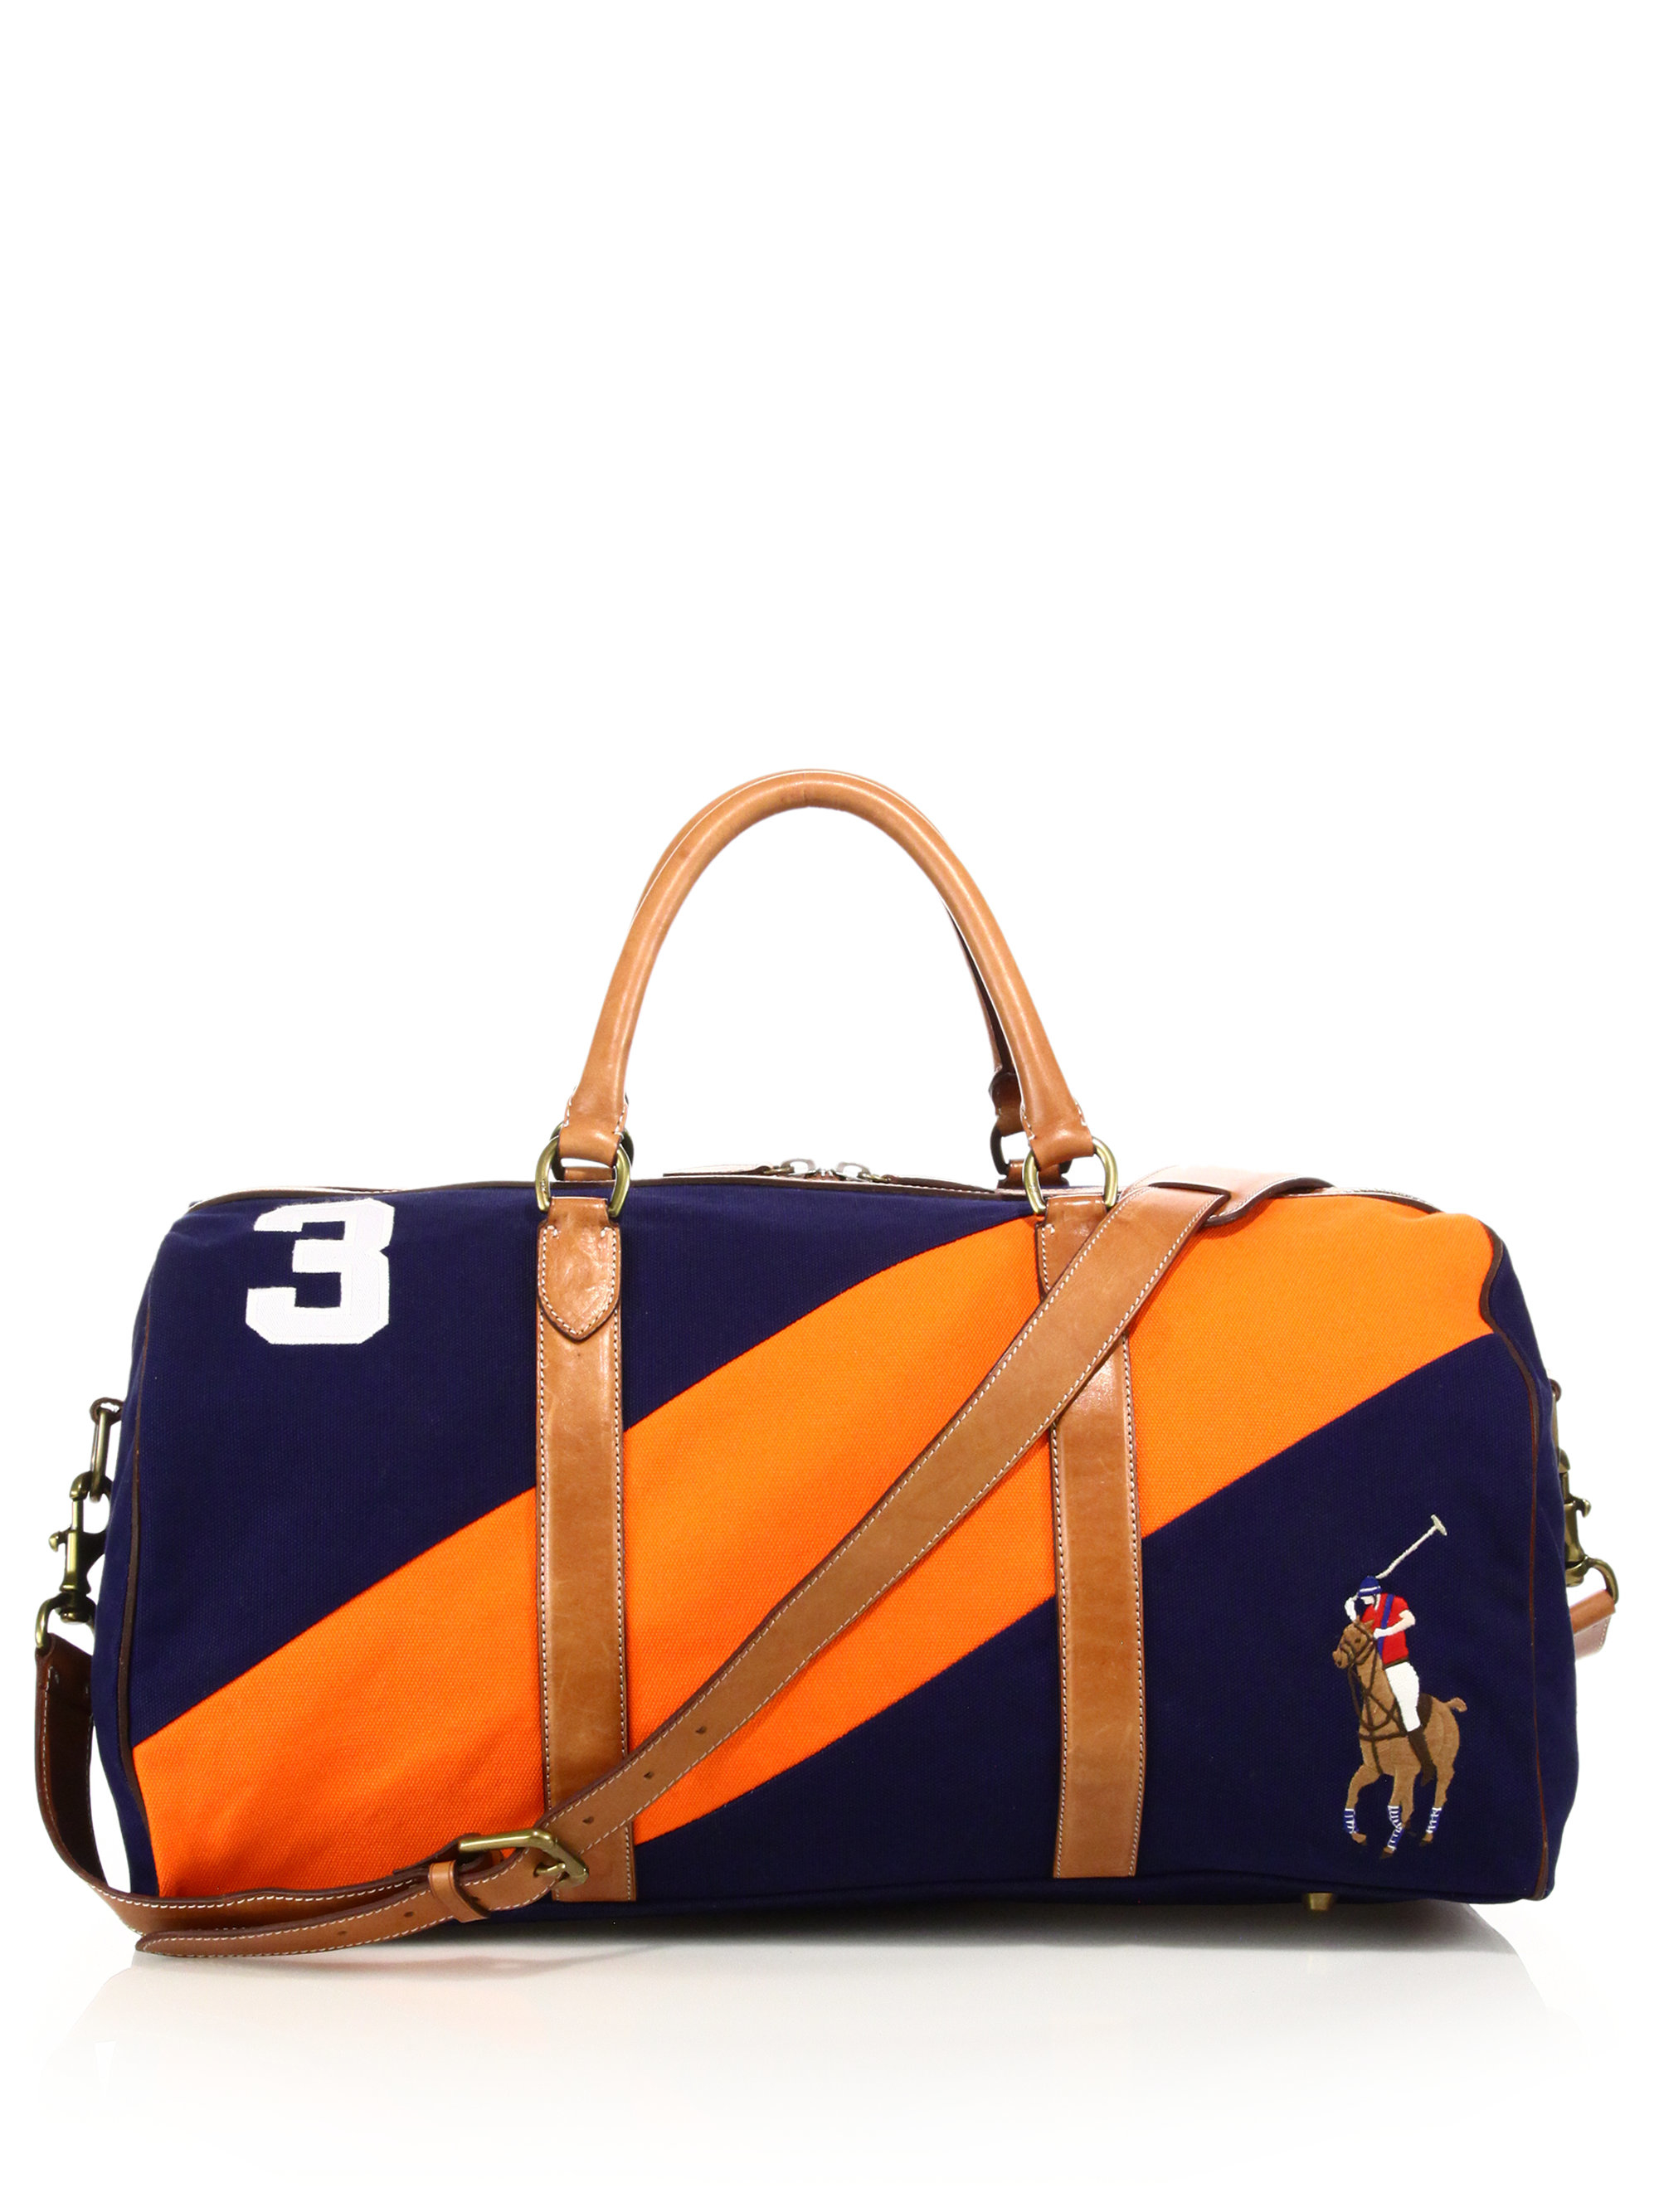 Mens Ralph Lauren Duffle Bags  b169113695e1b